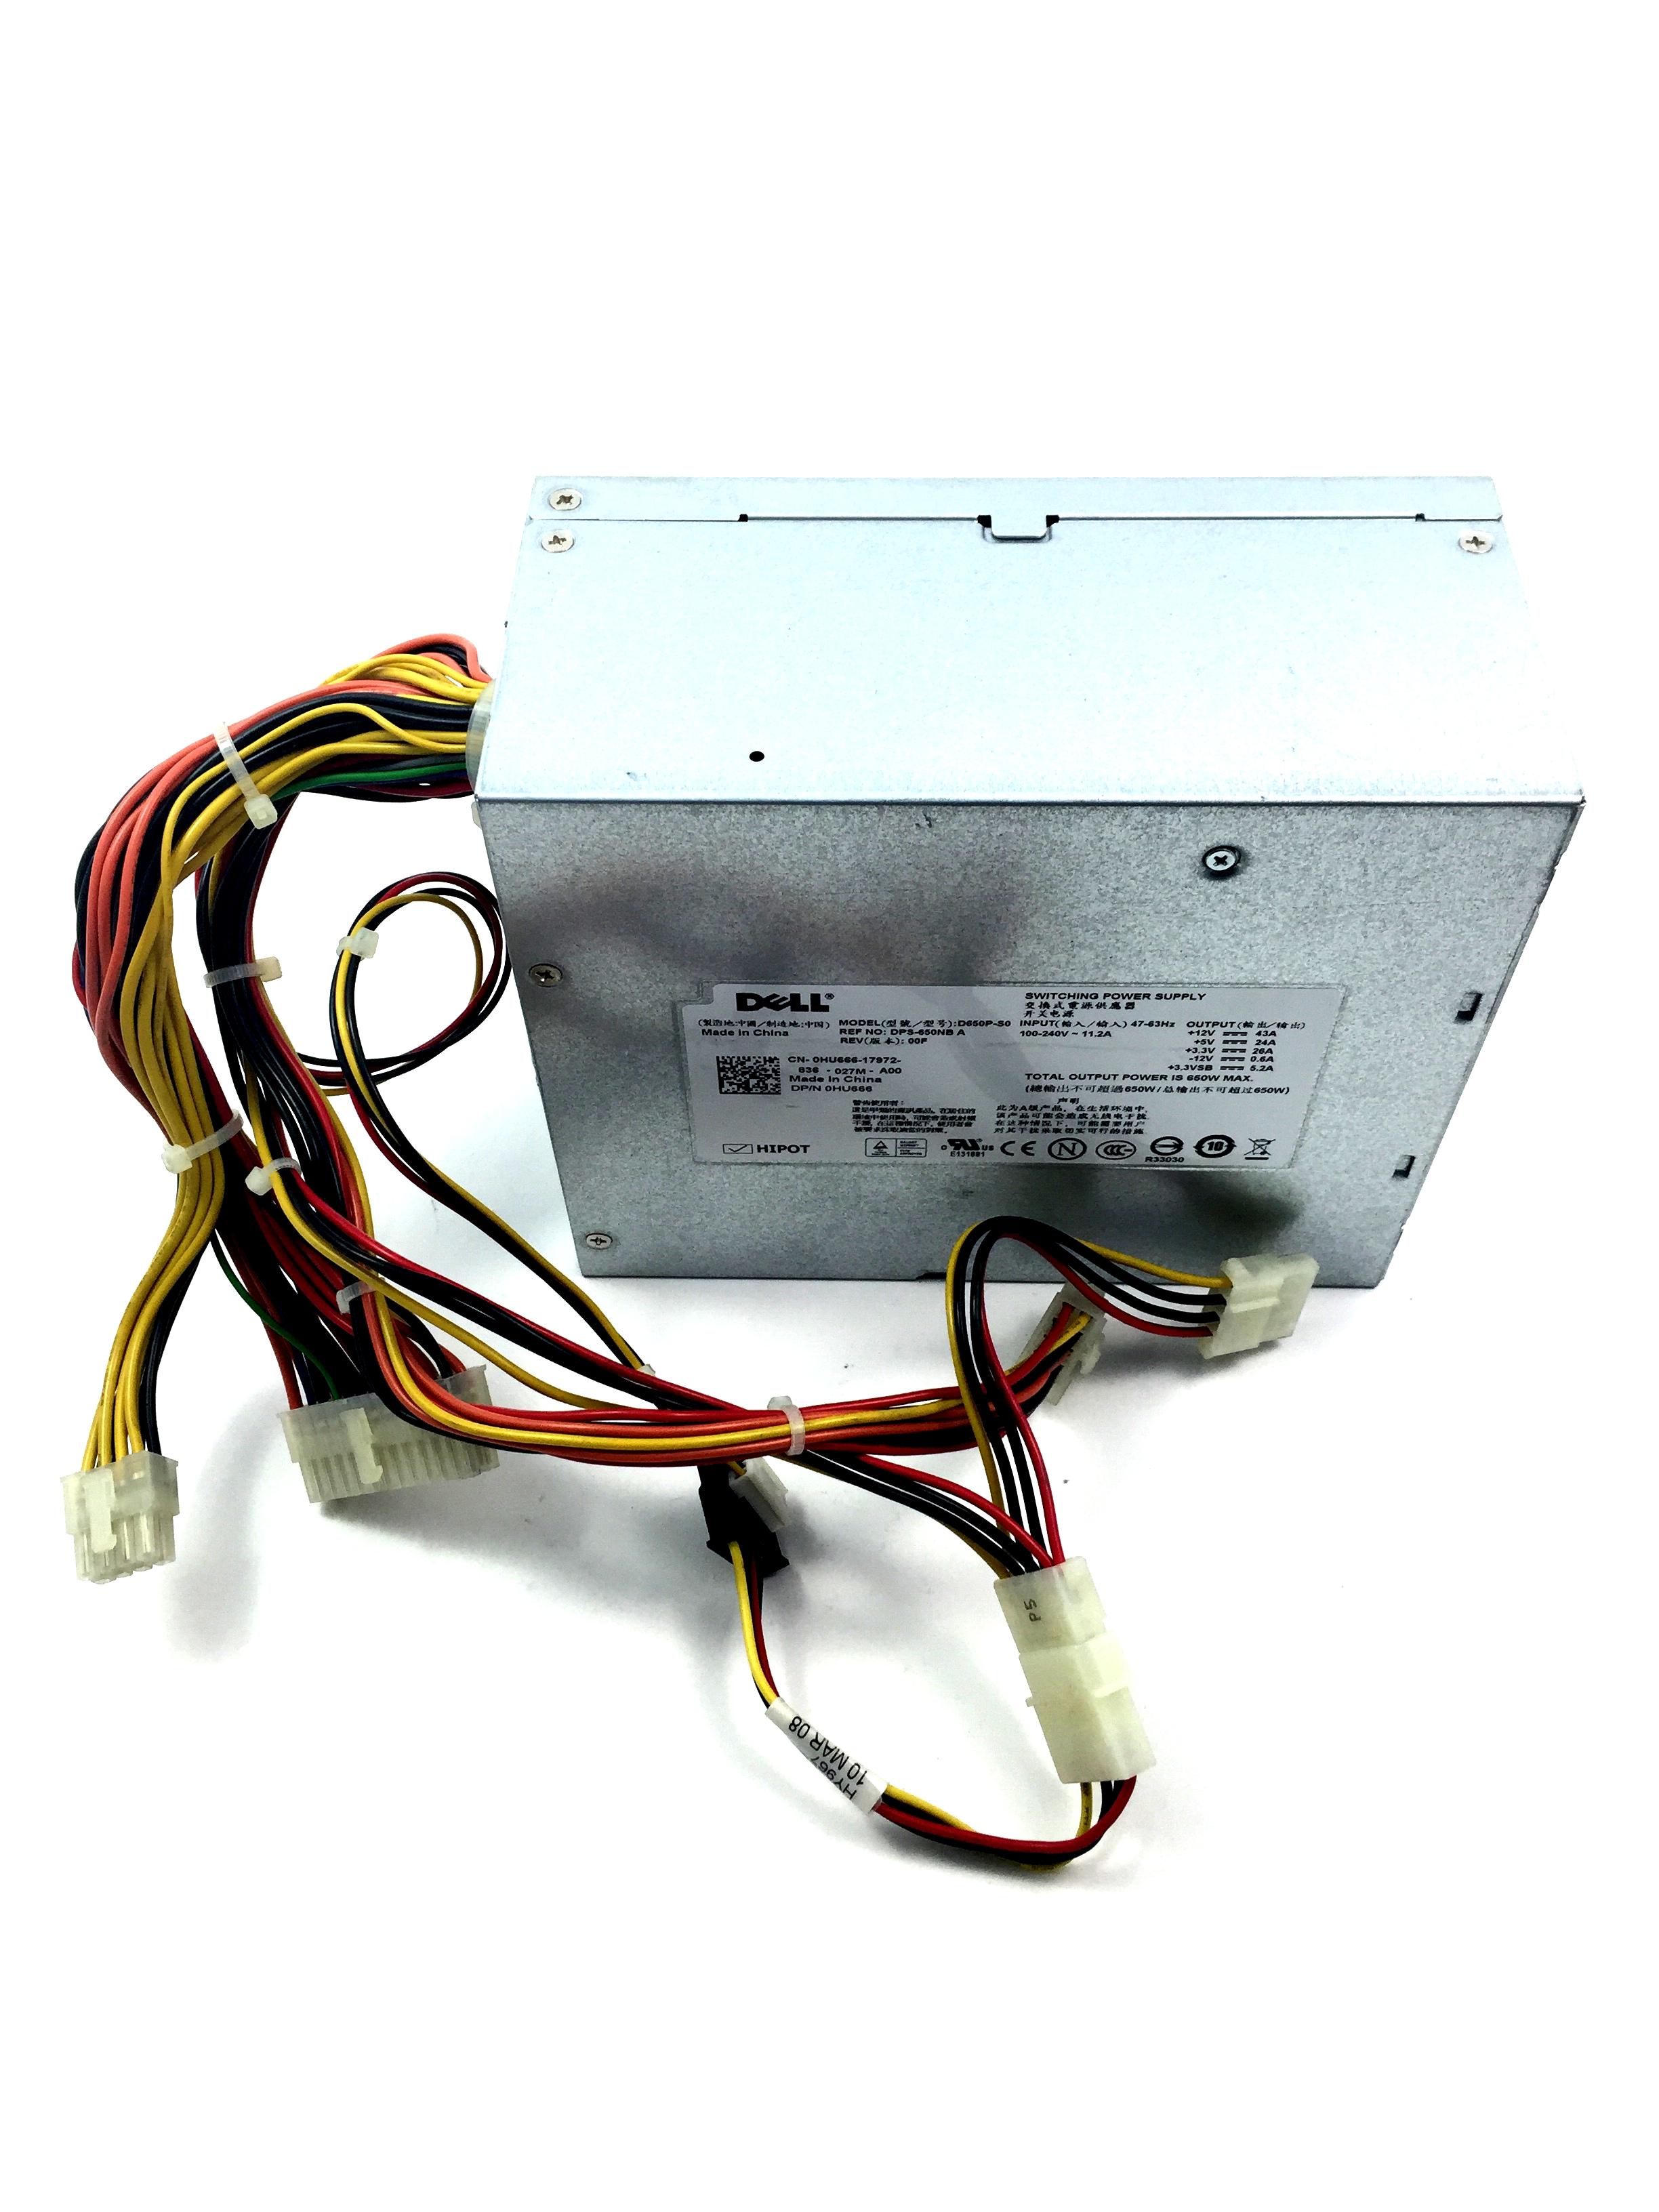 Dell PowerEdge T605 650W Server Power Supply (HU666)